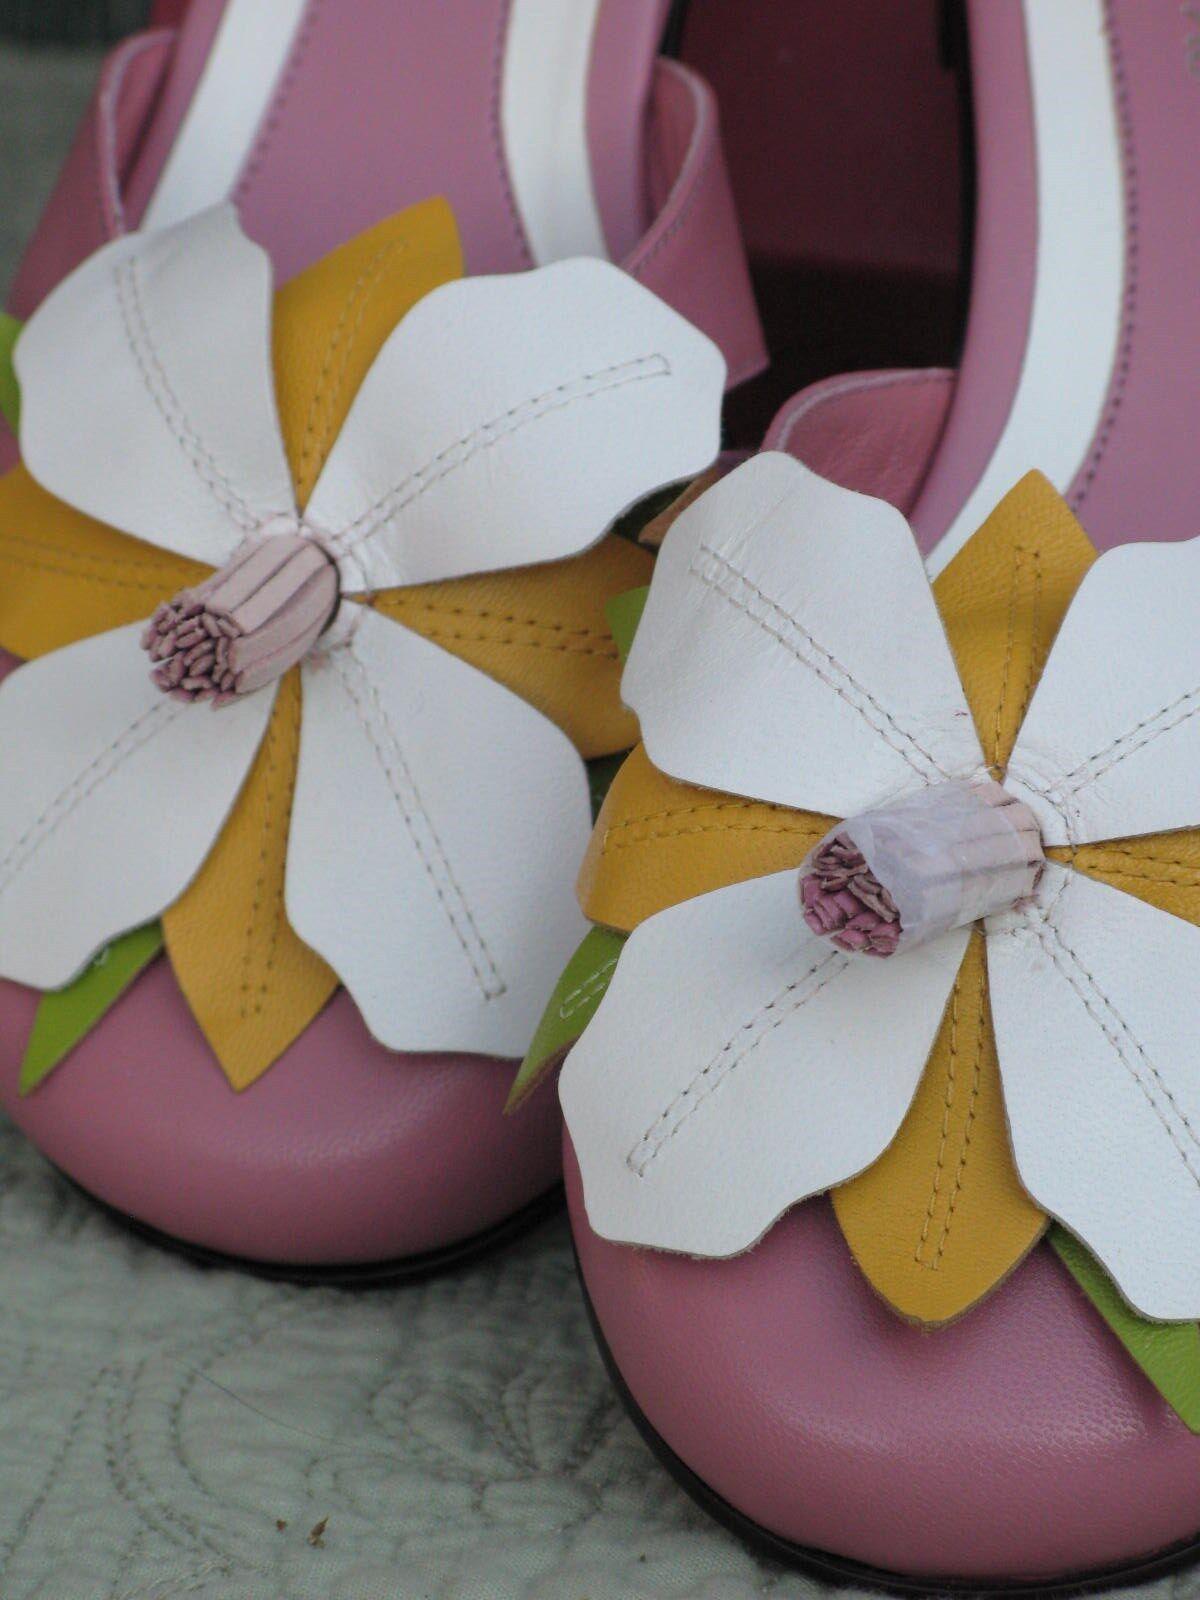 Vis New a Vie Donna Mule/Sandels Shoes Pink Pelle 6.5M New Vis in Box Flower Detail aeed39